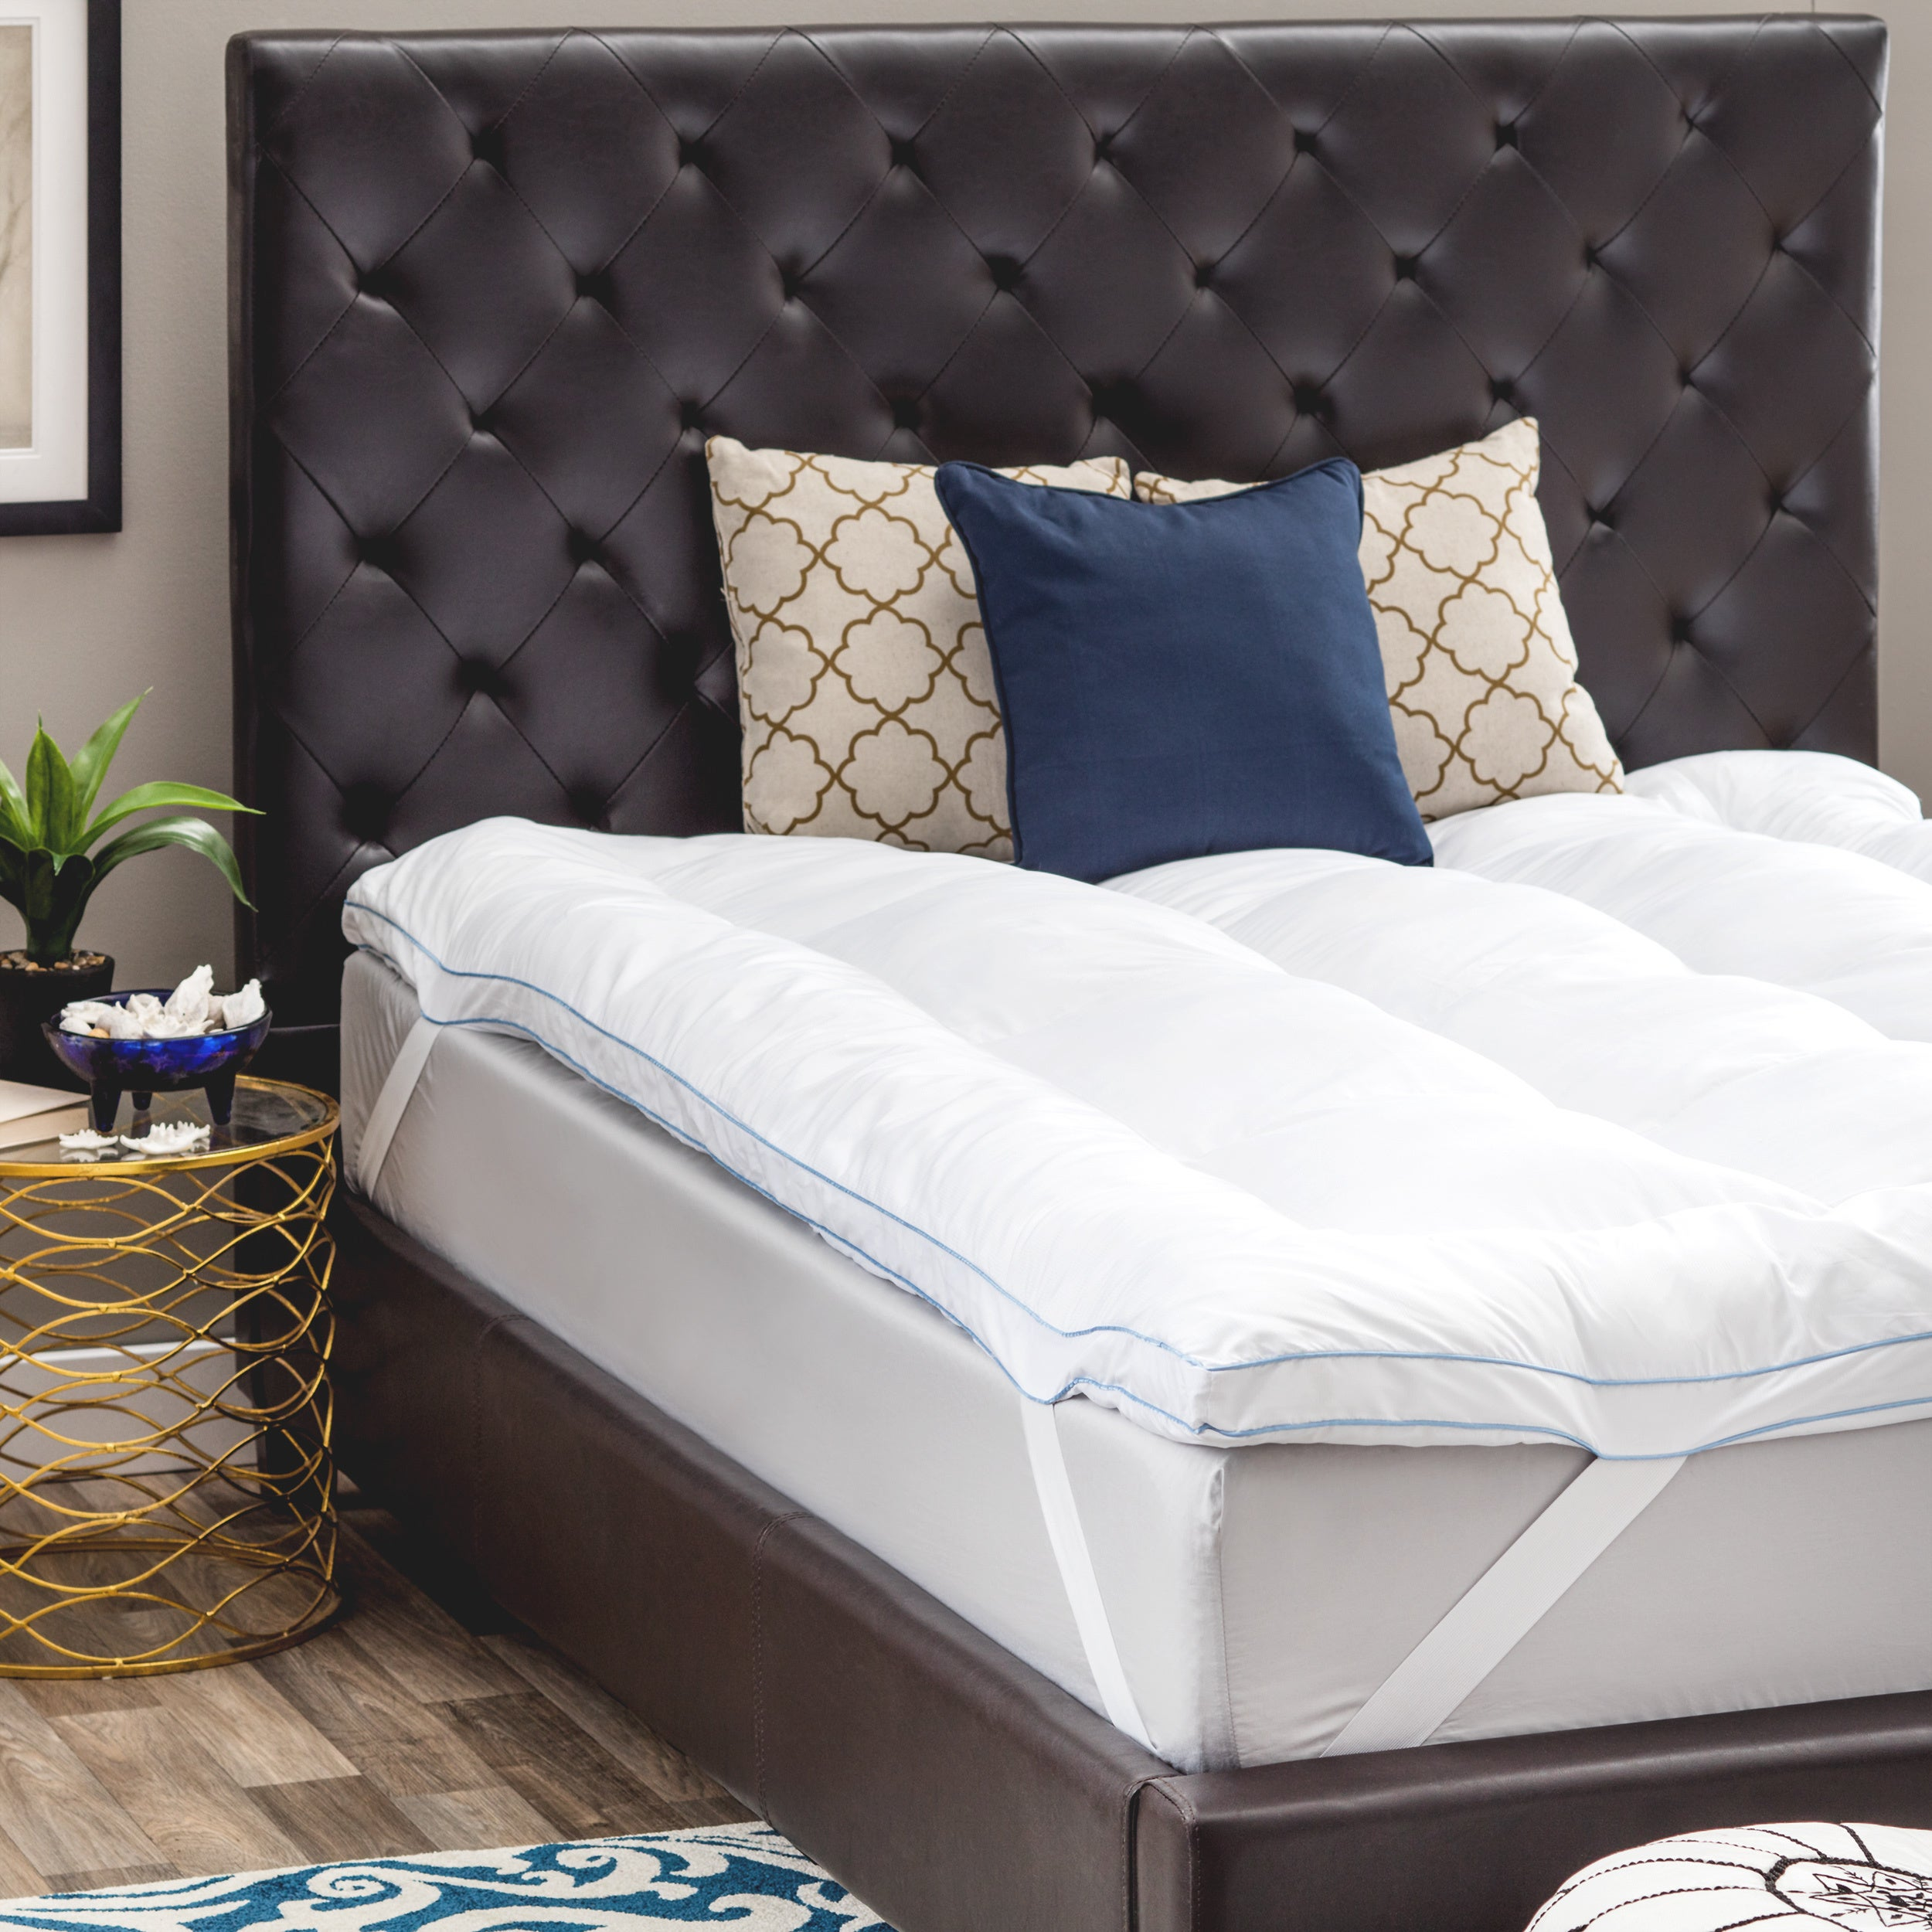 topper fiber cotton foam and ip memory inch walmart swisslux deluxe com blend mattress